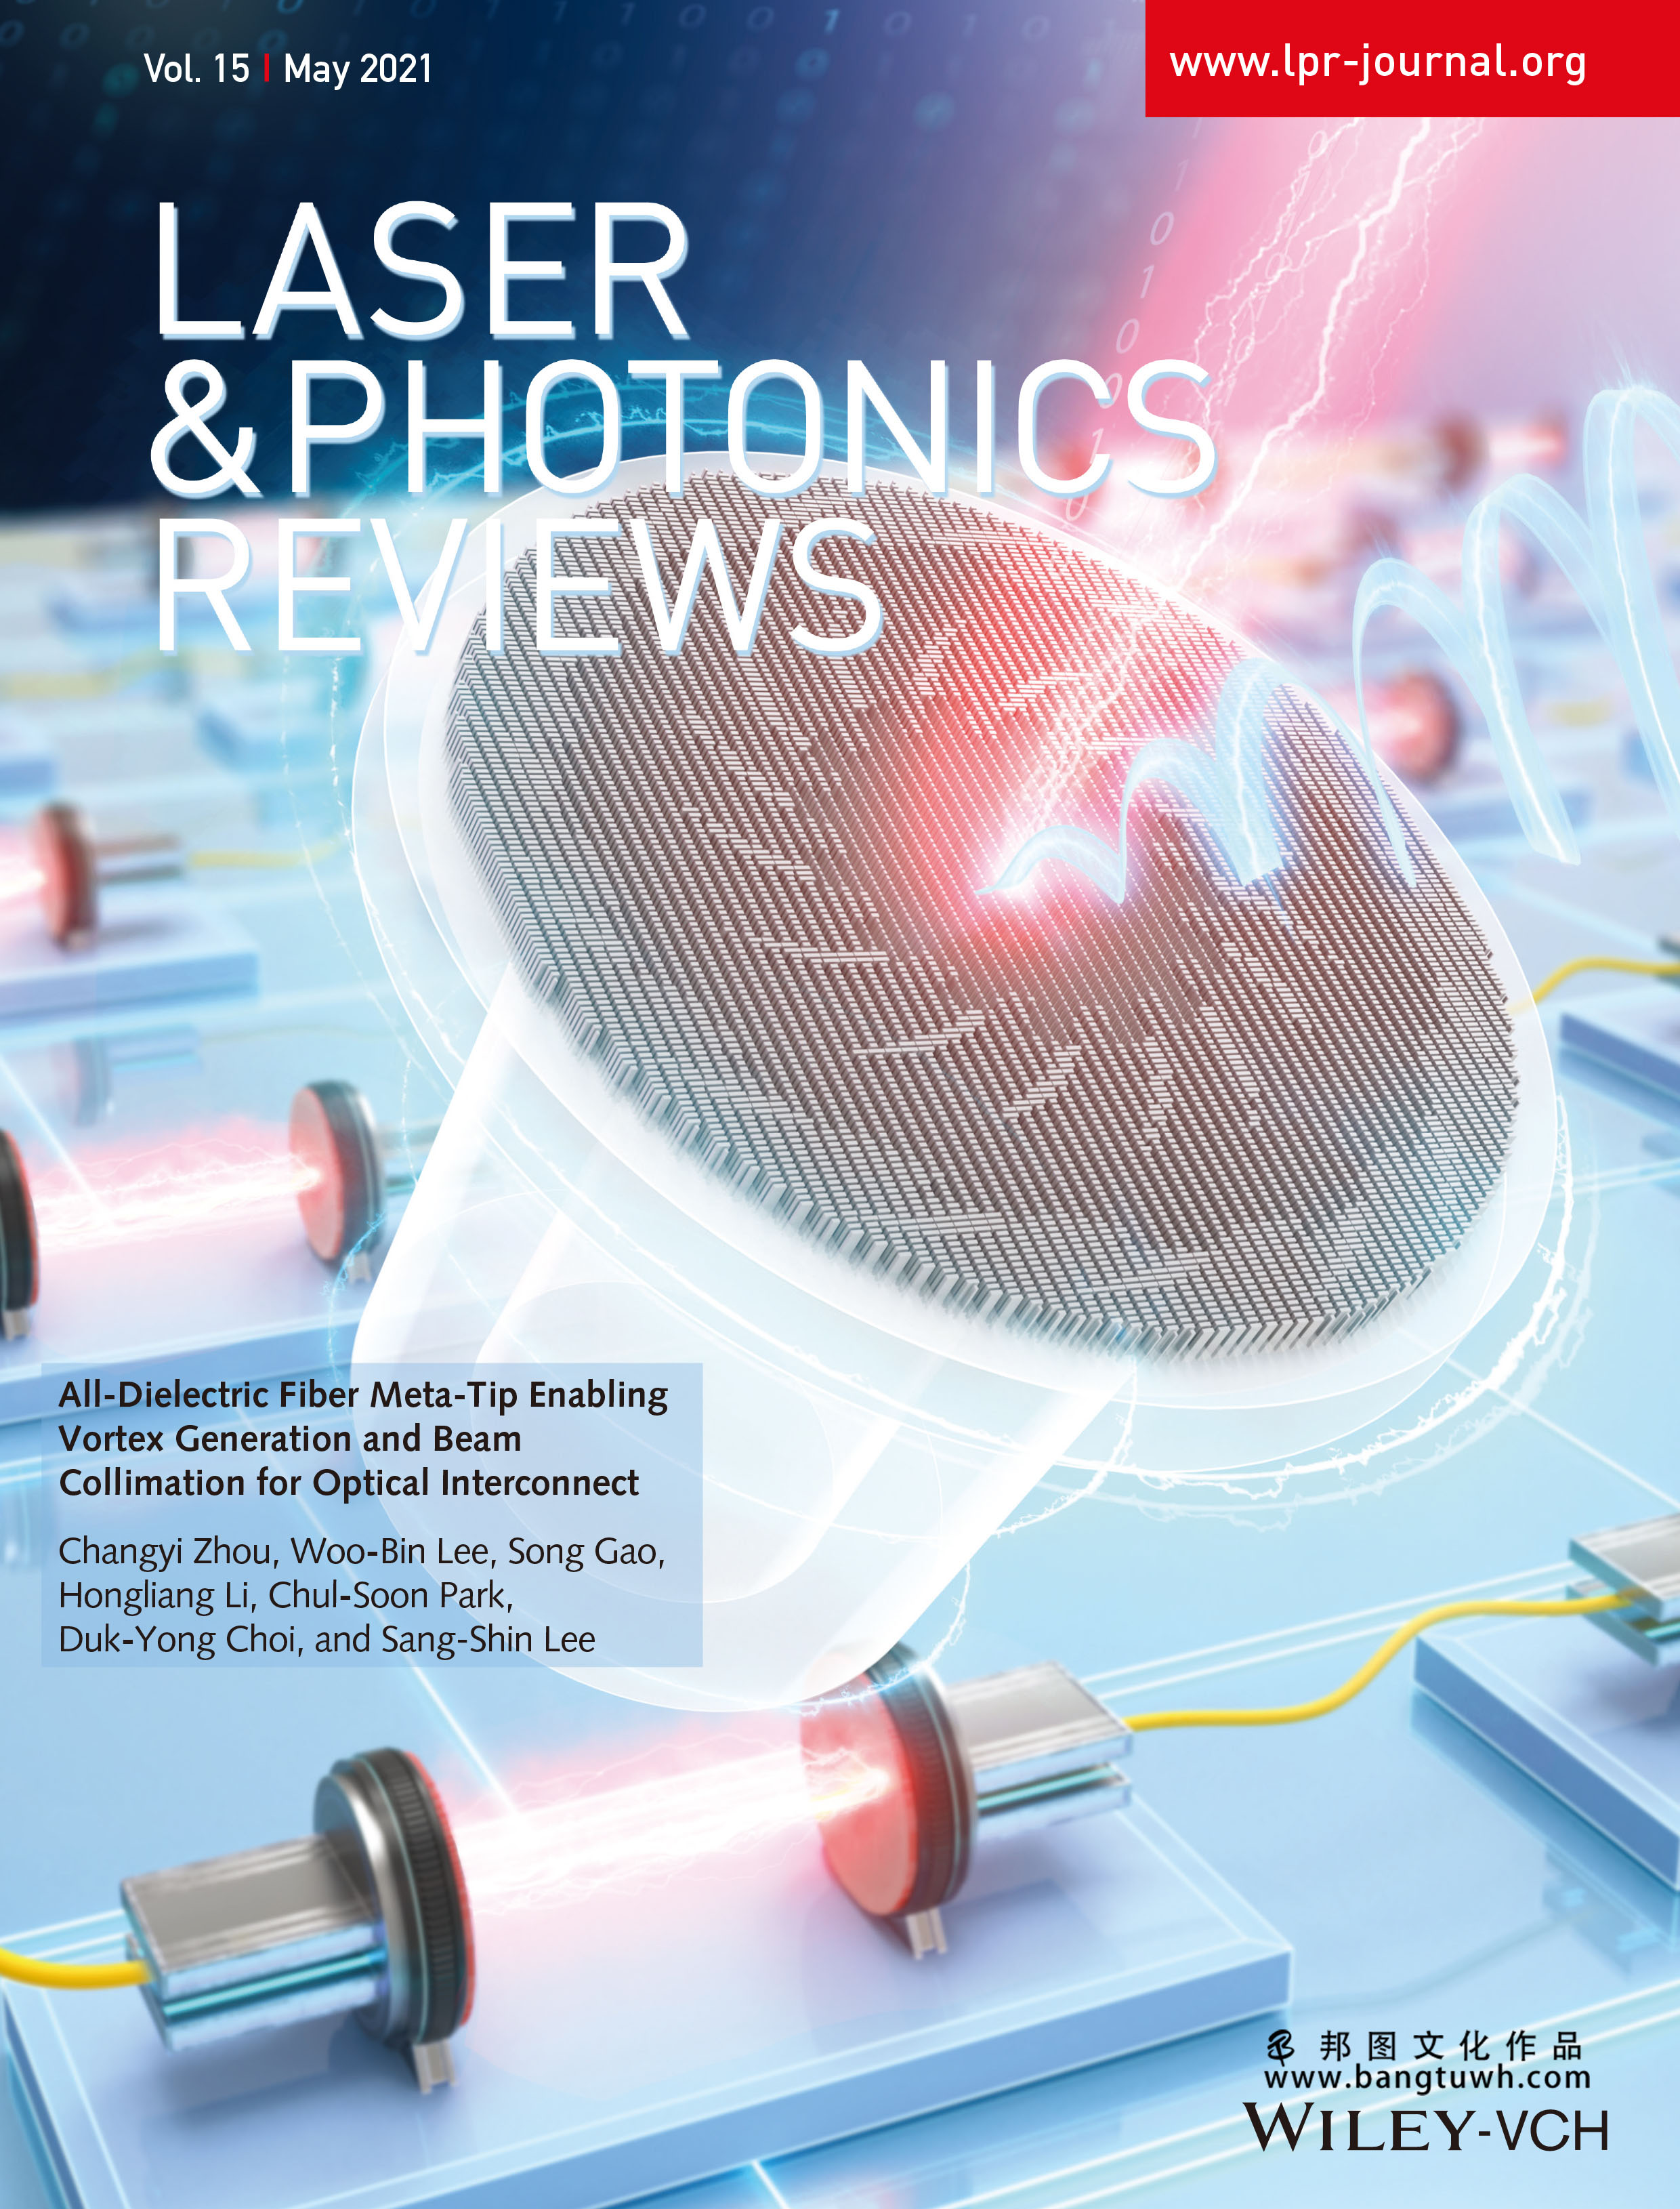 Laser &Photonics Reviews 韩国光云大学